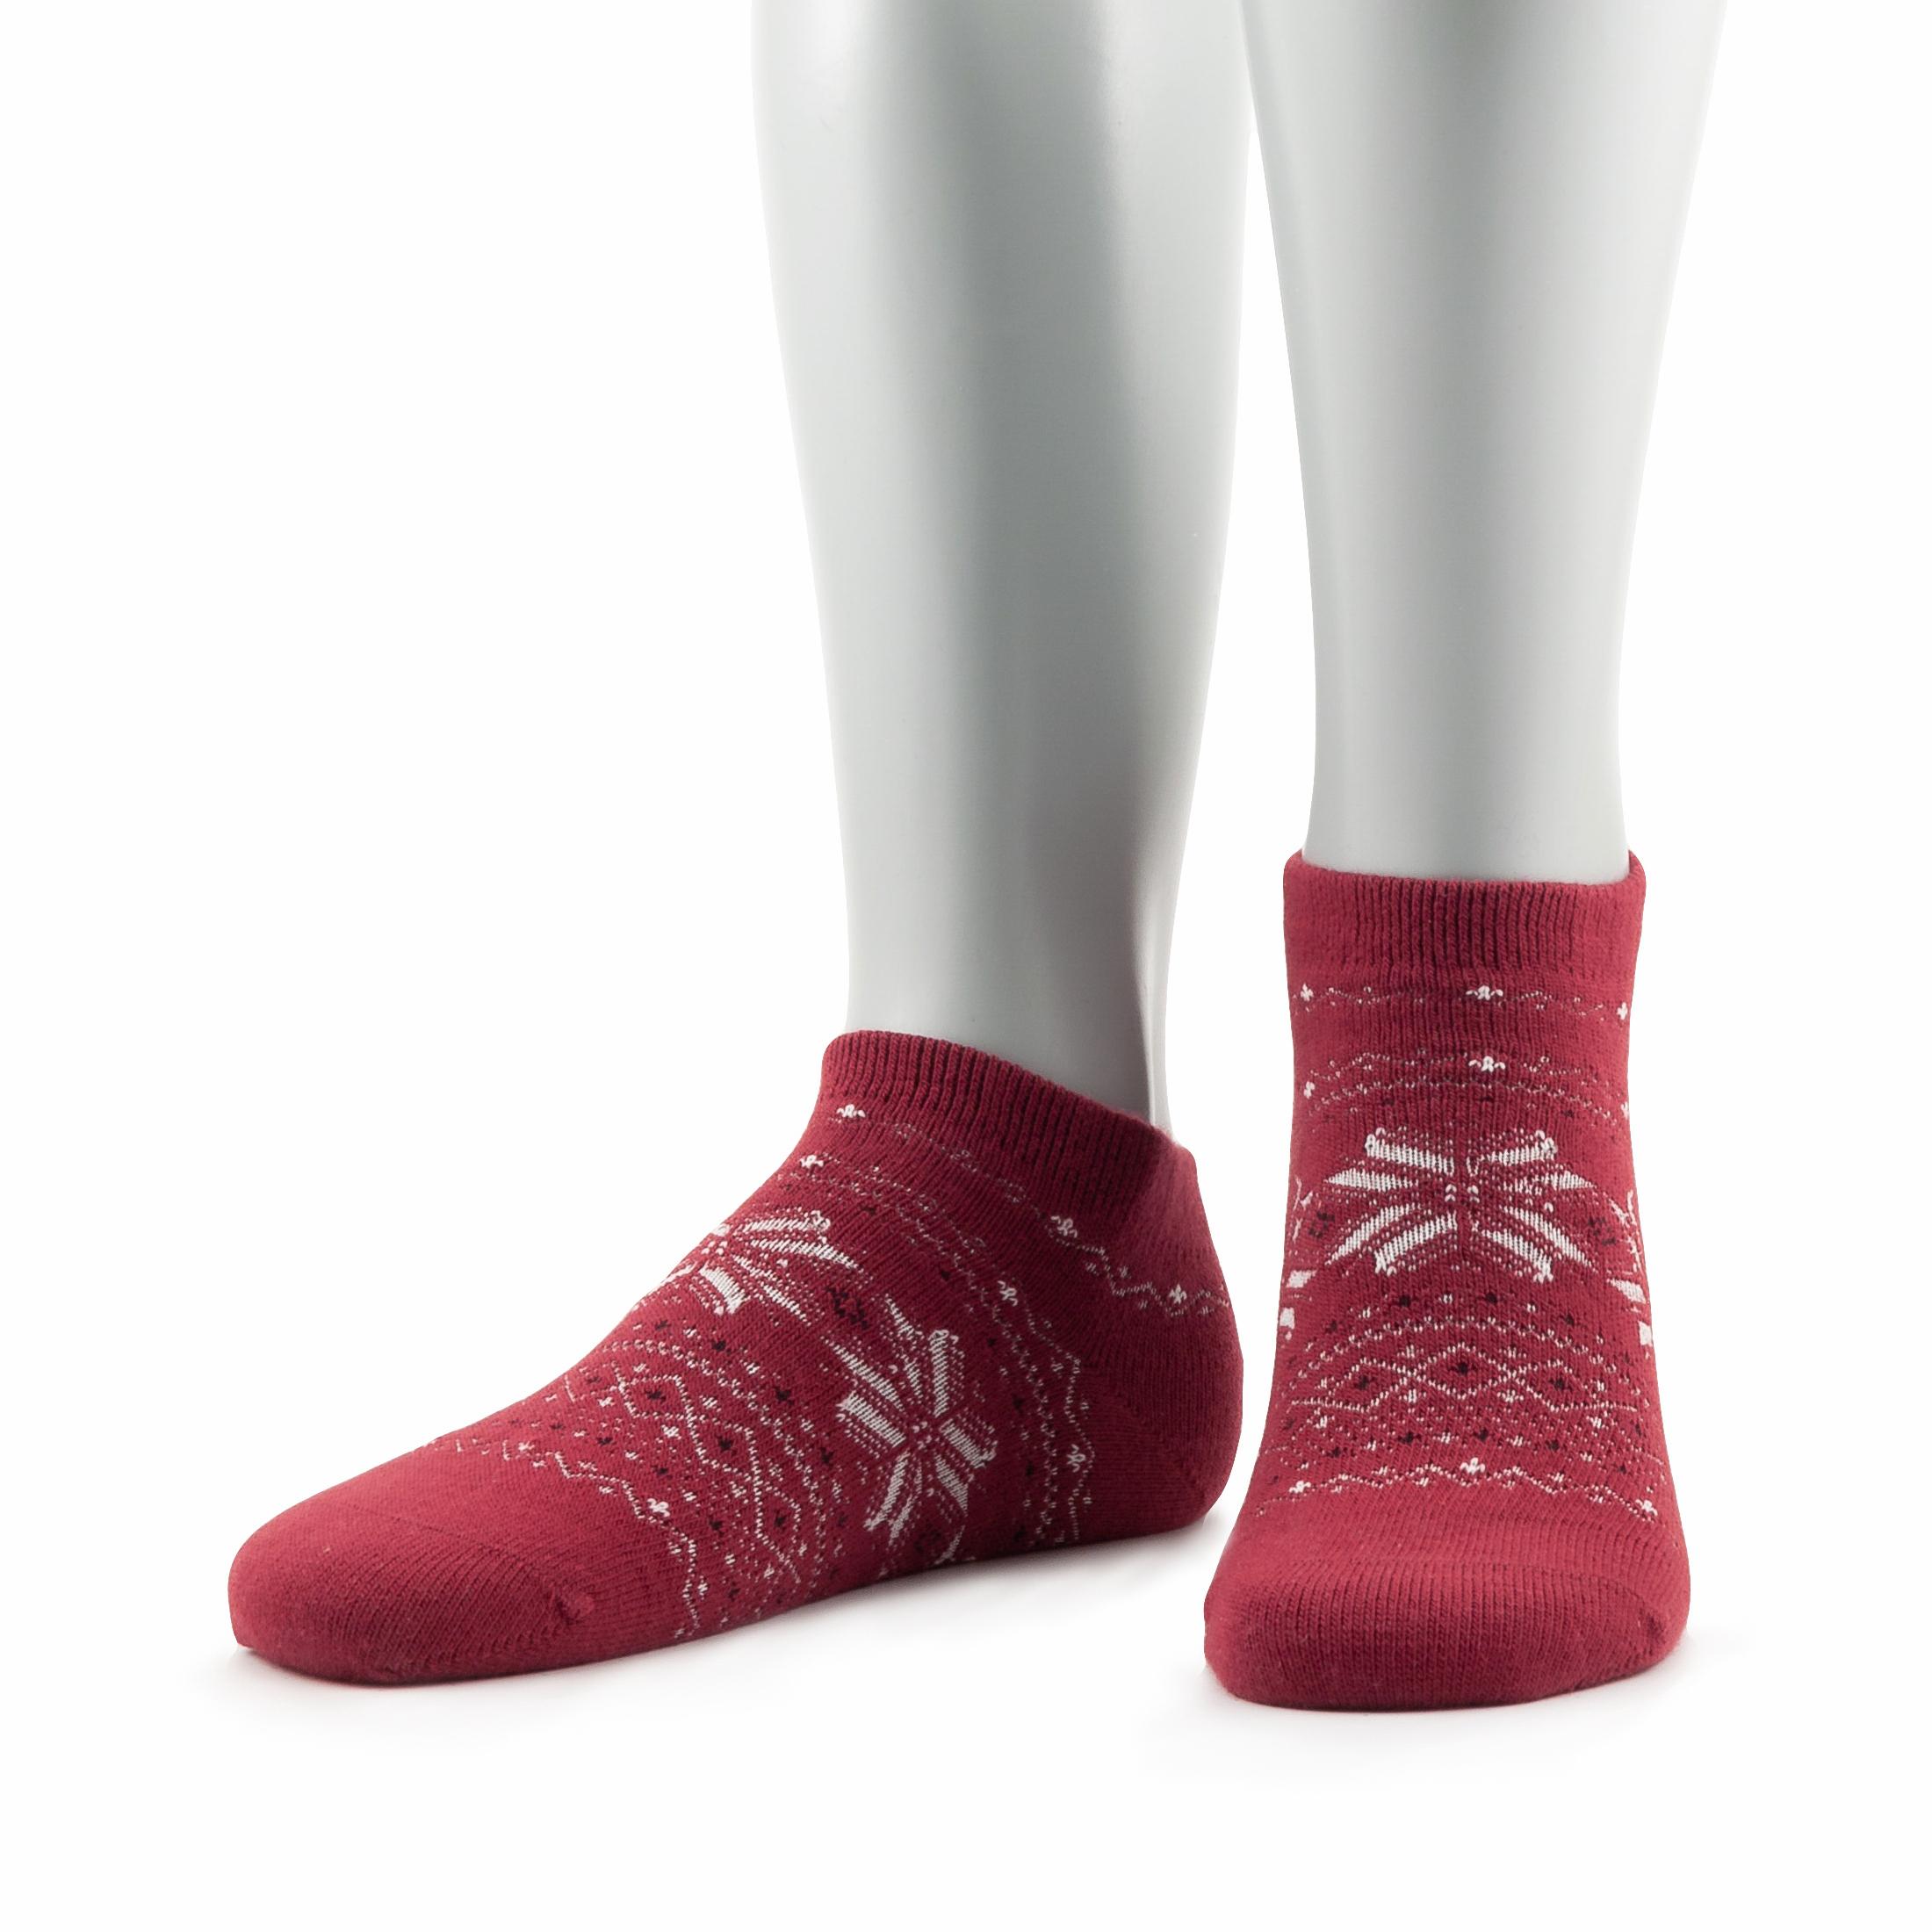 Женские носки из полушерсти Grinston socks